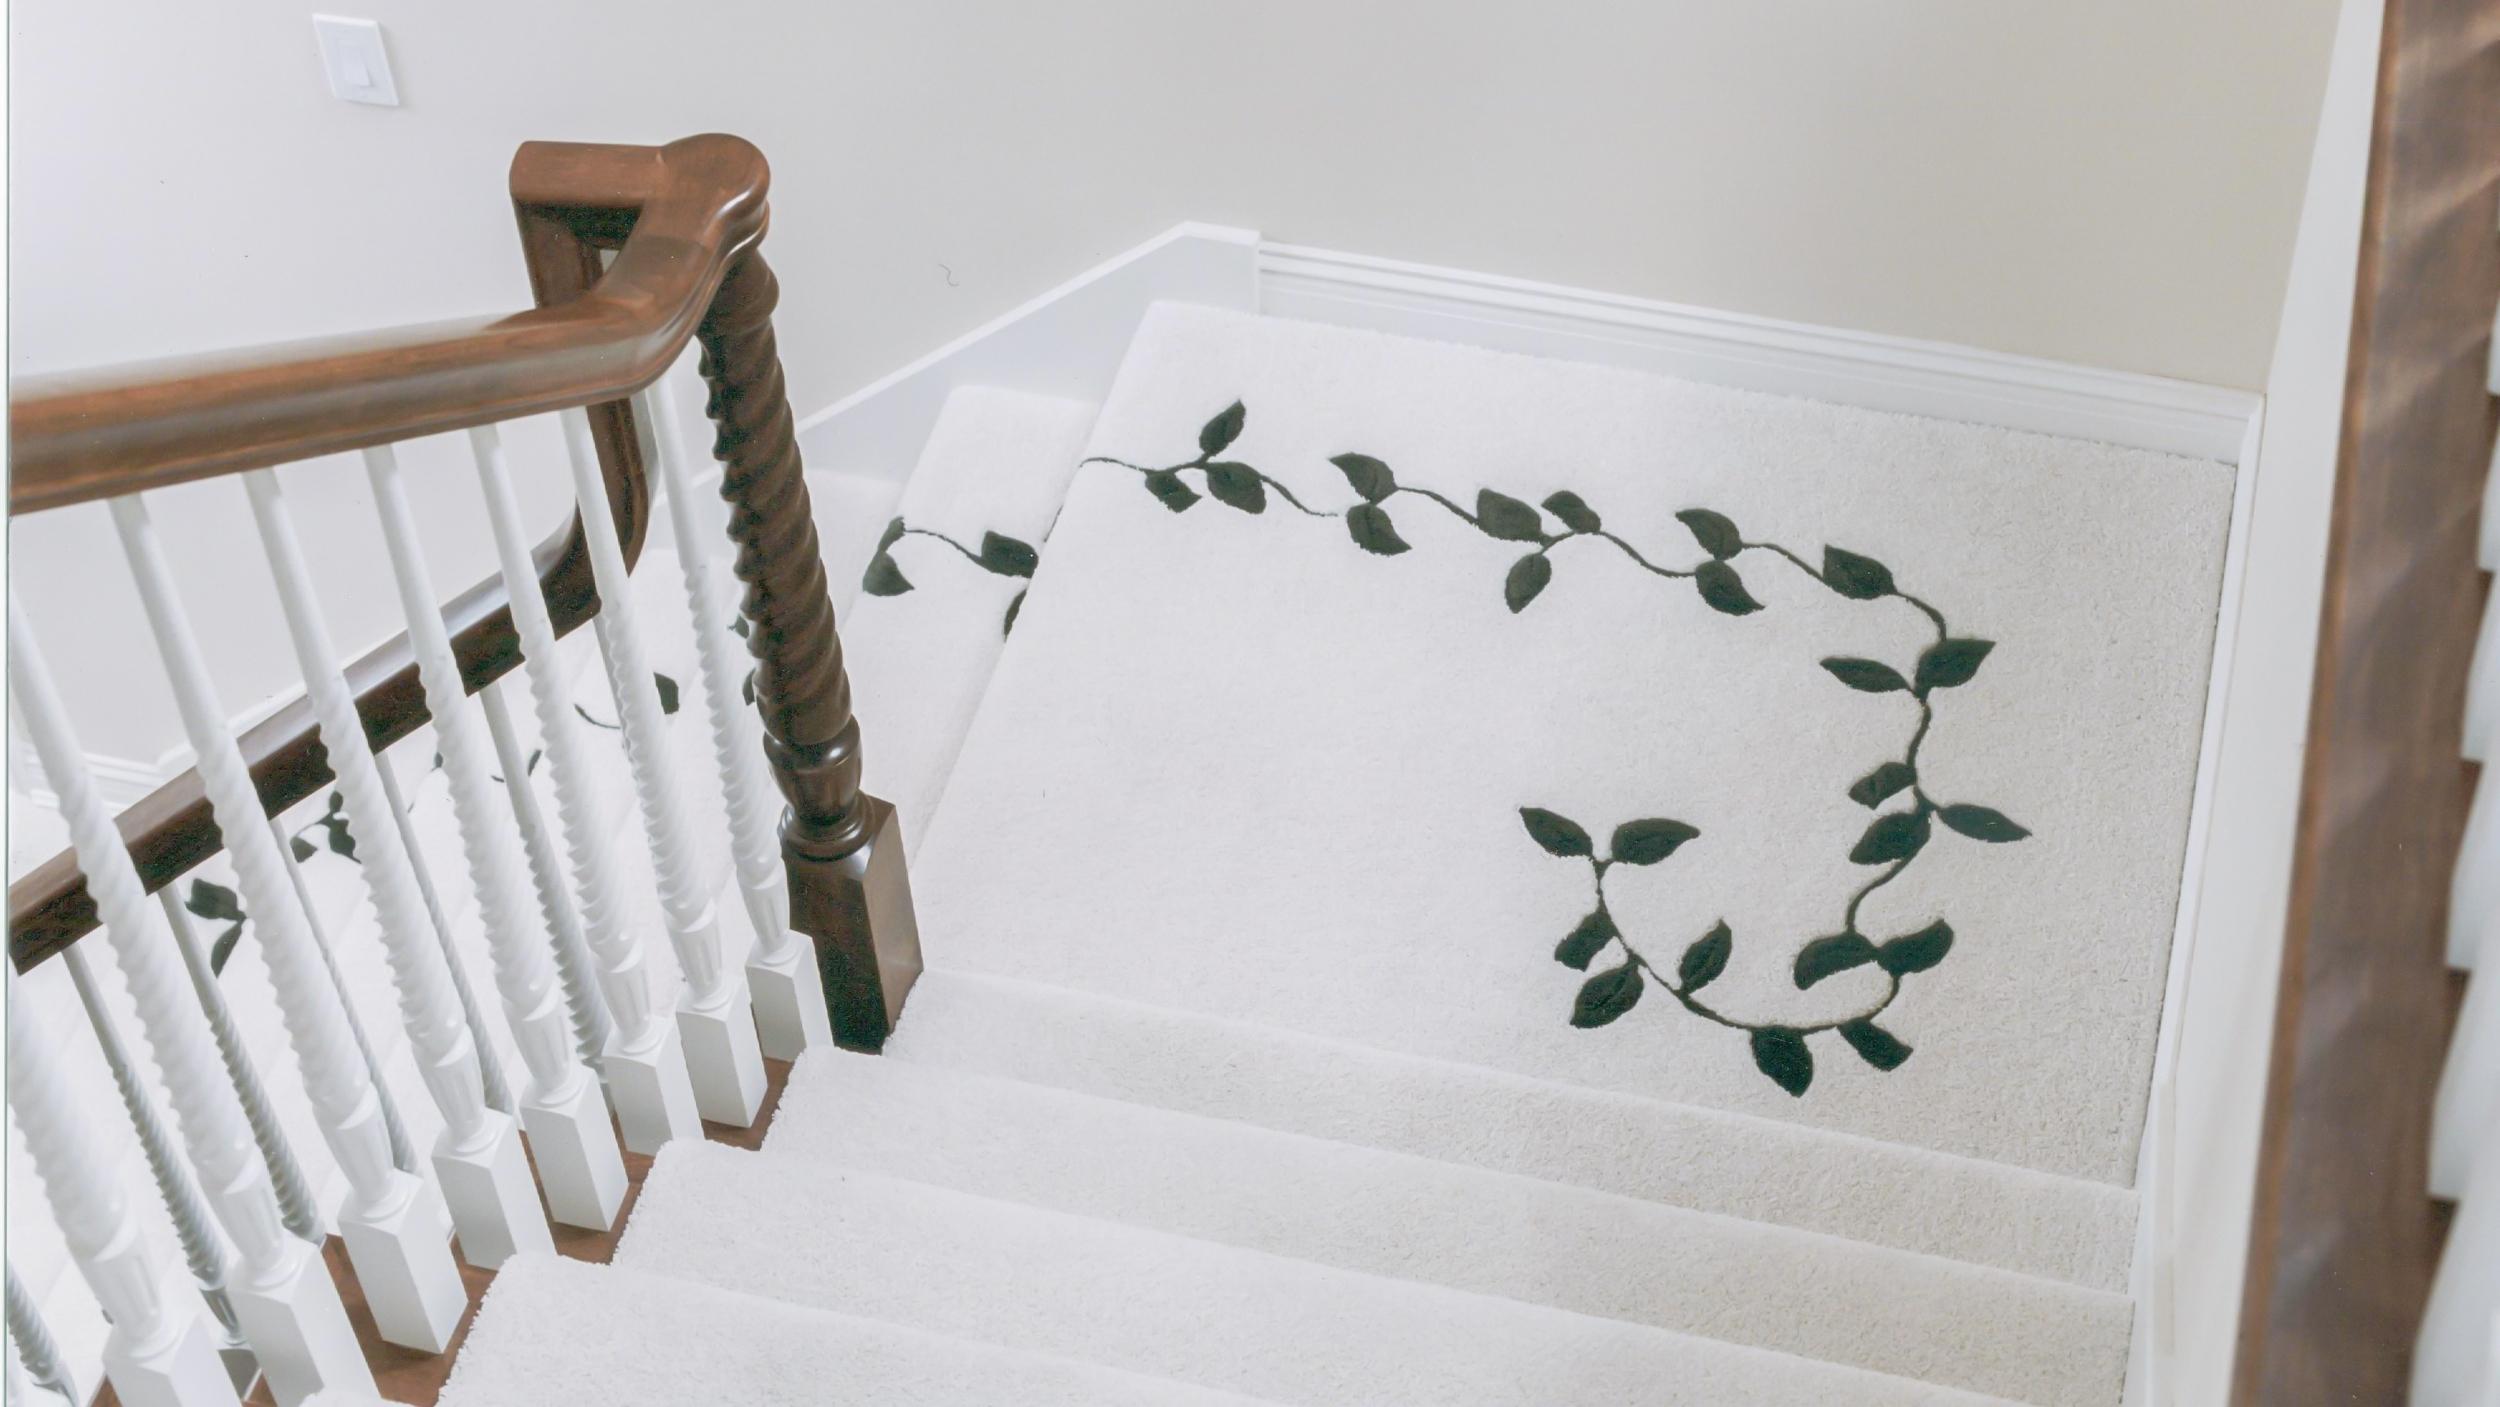 Vine Inset on Stairway